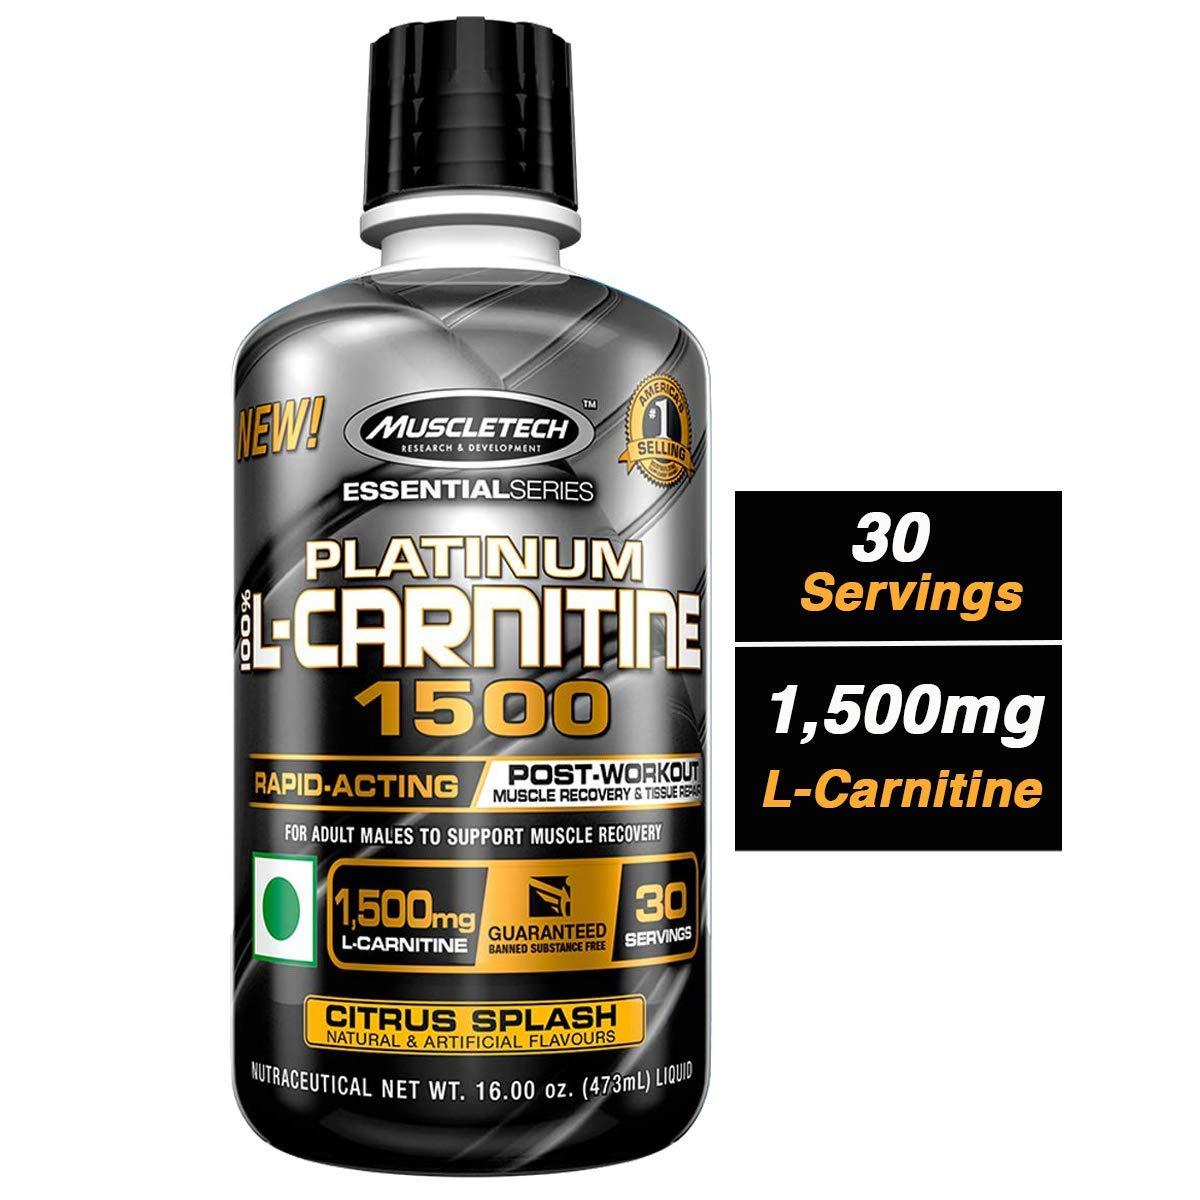 MuscleTech Essential Series 100%, L-carnitine Citrus Splash, 16 Ounce by MuscleTech